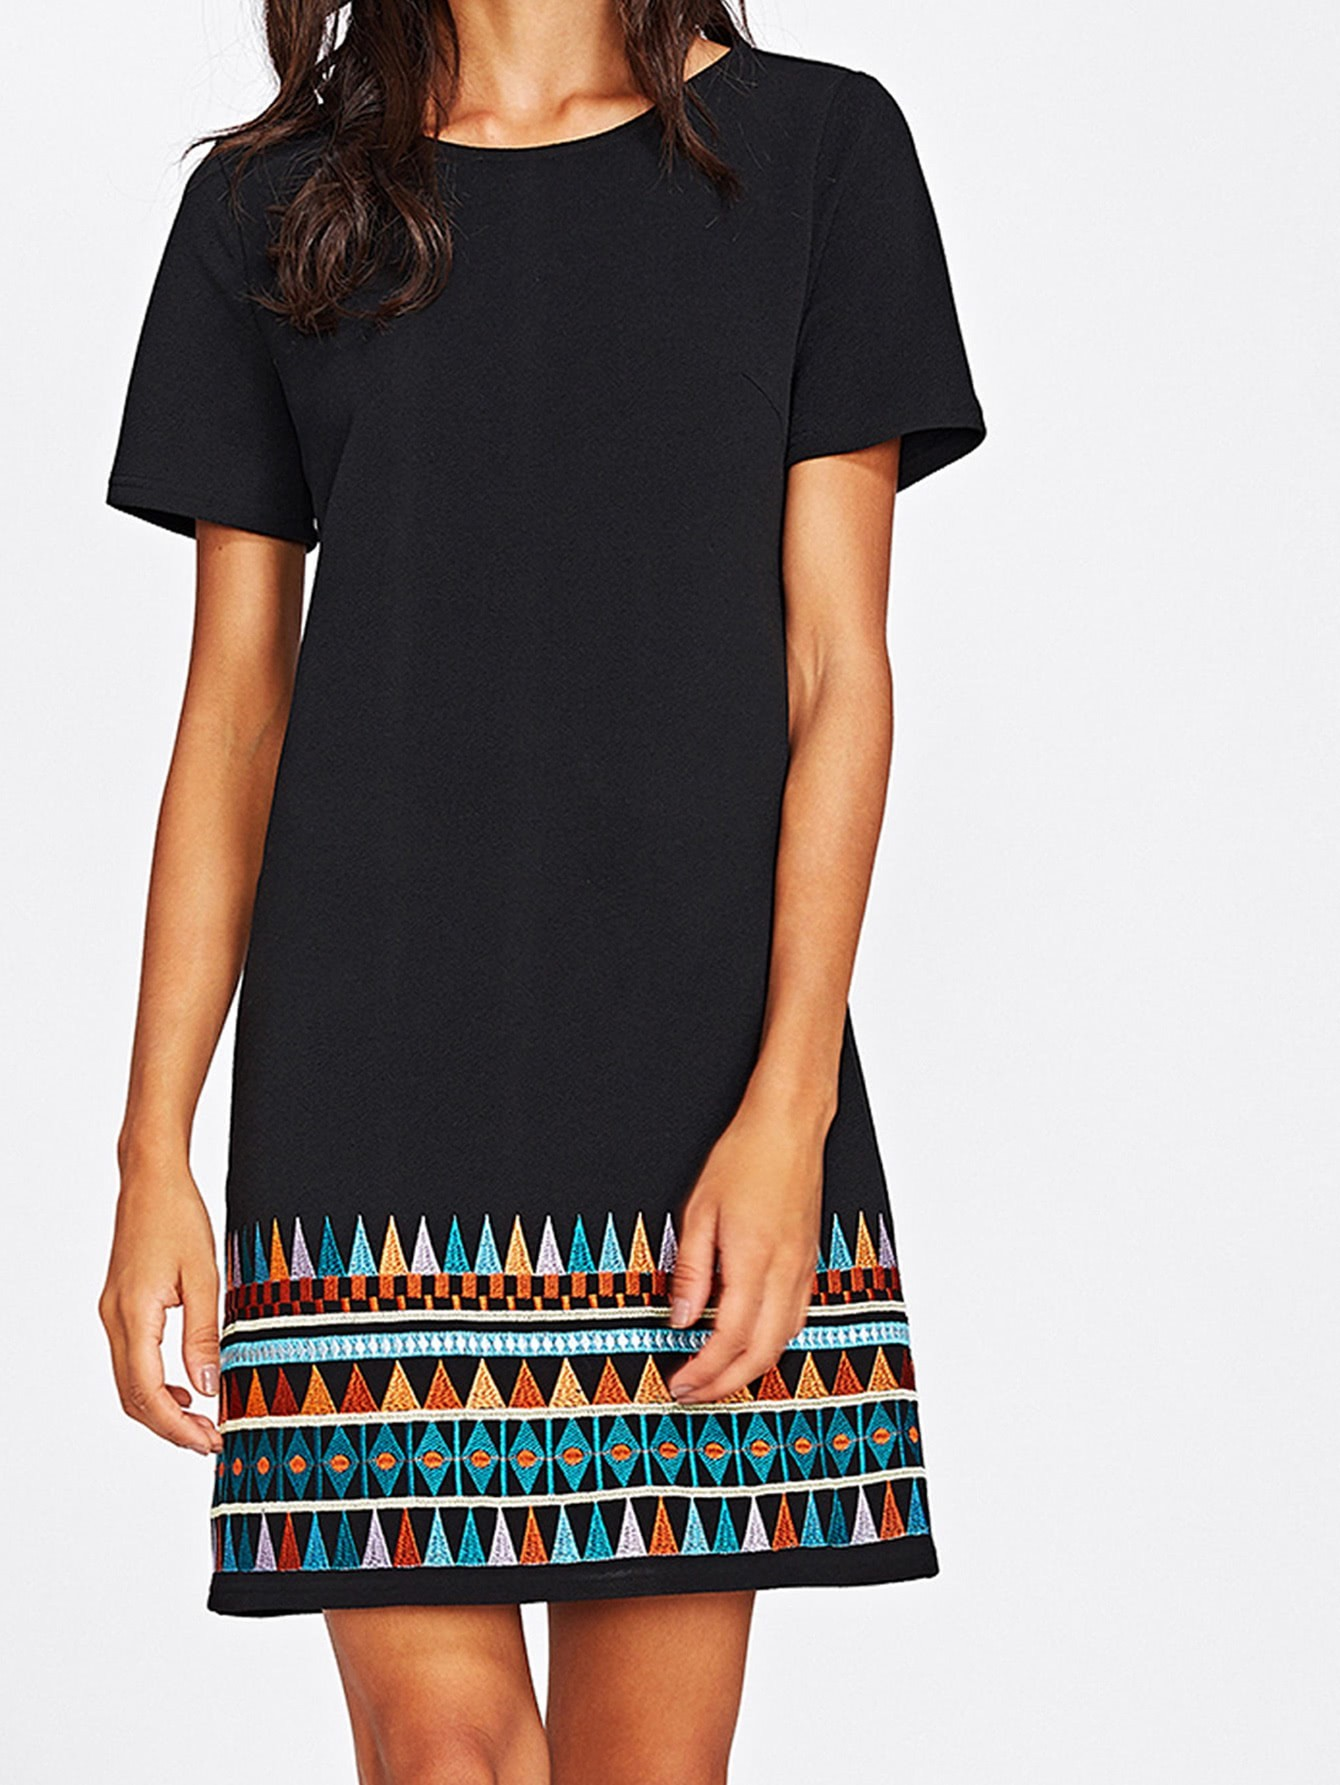 Aztec Embroidered Hem Dress embroidered double layer asym hem sheath dress